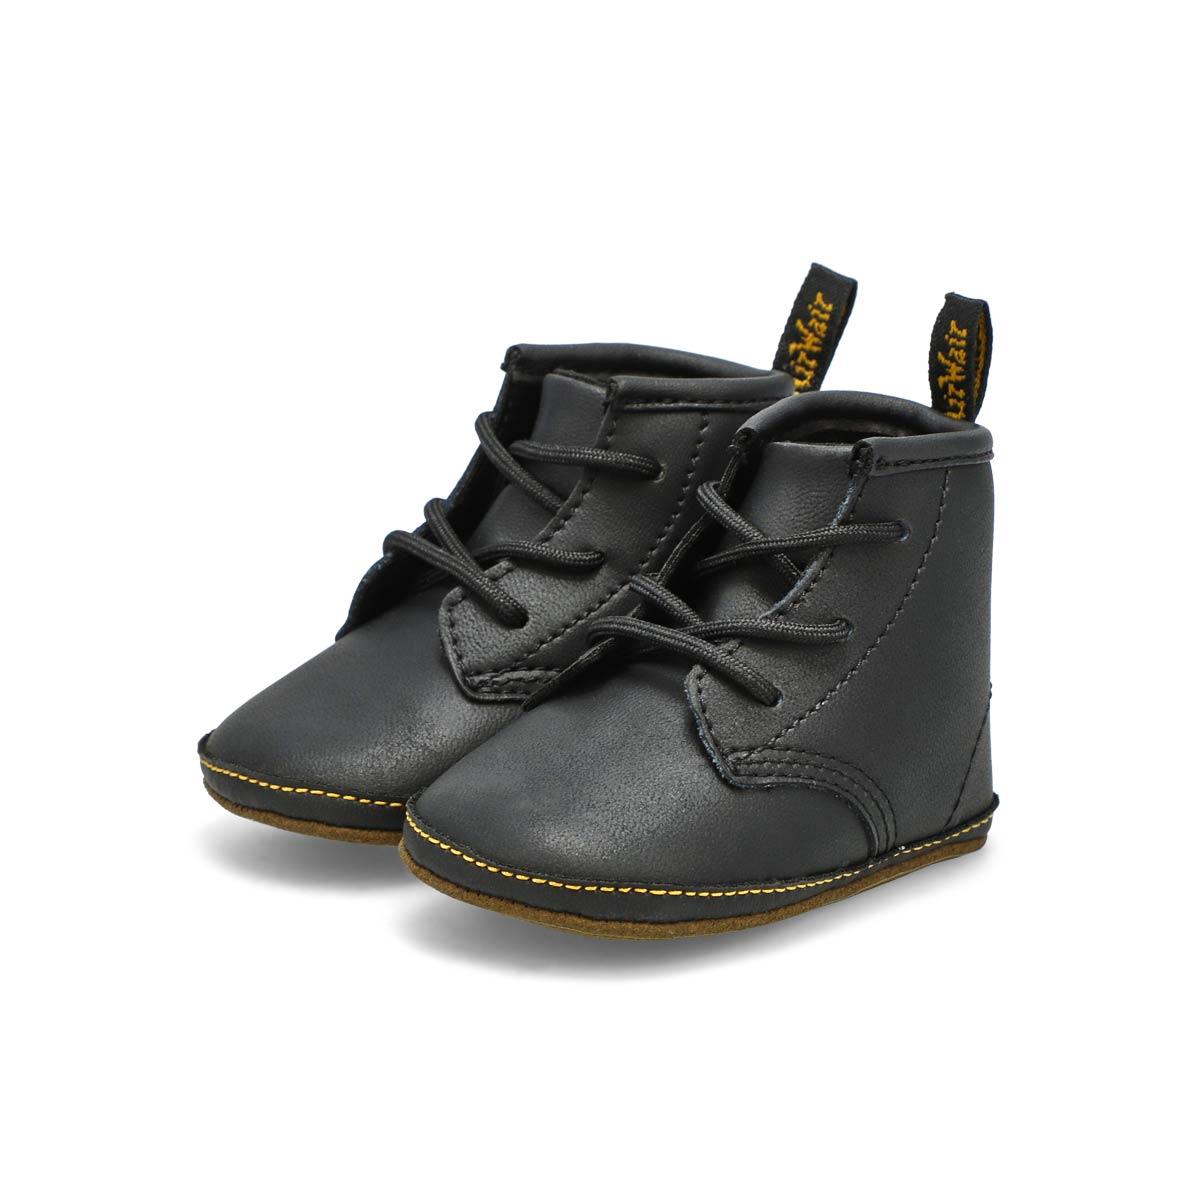 Infants' 1460 Crib Smooth Boot - Black